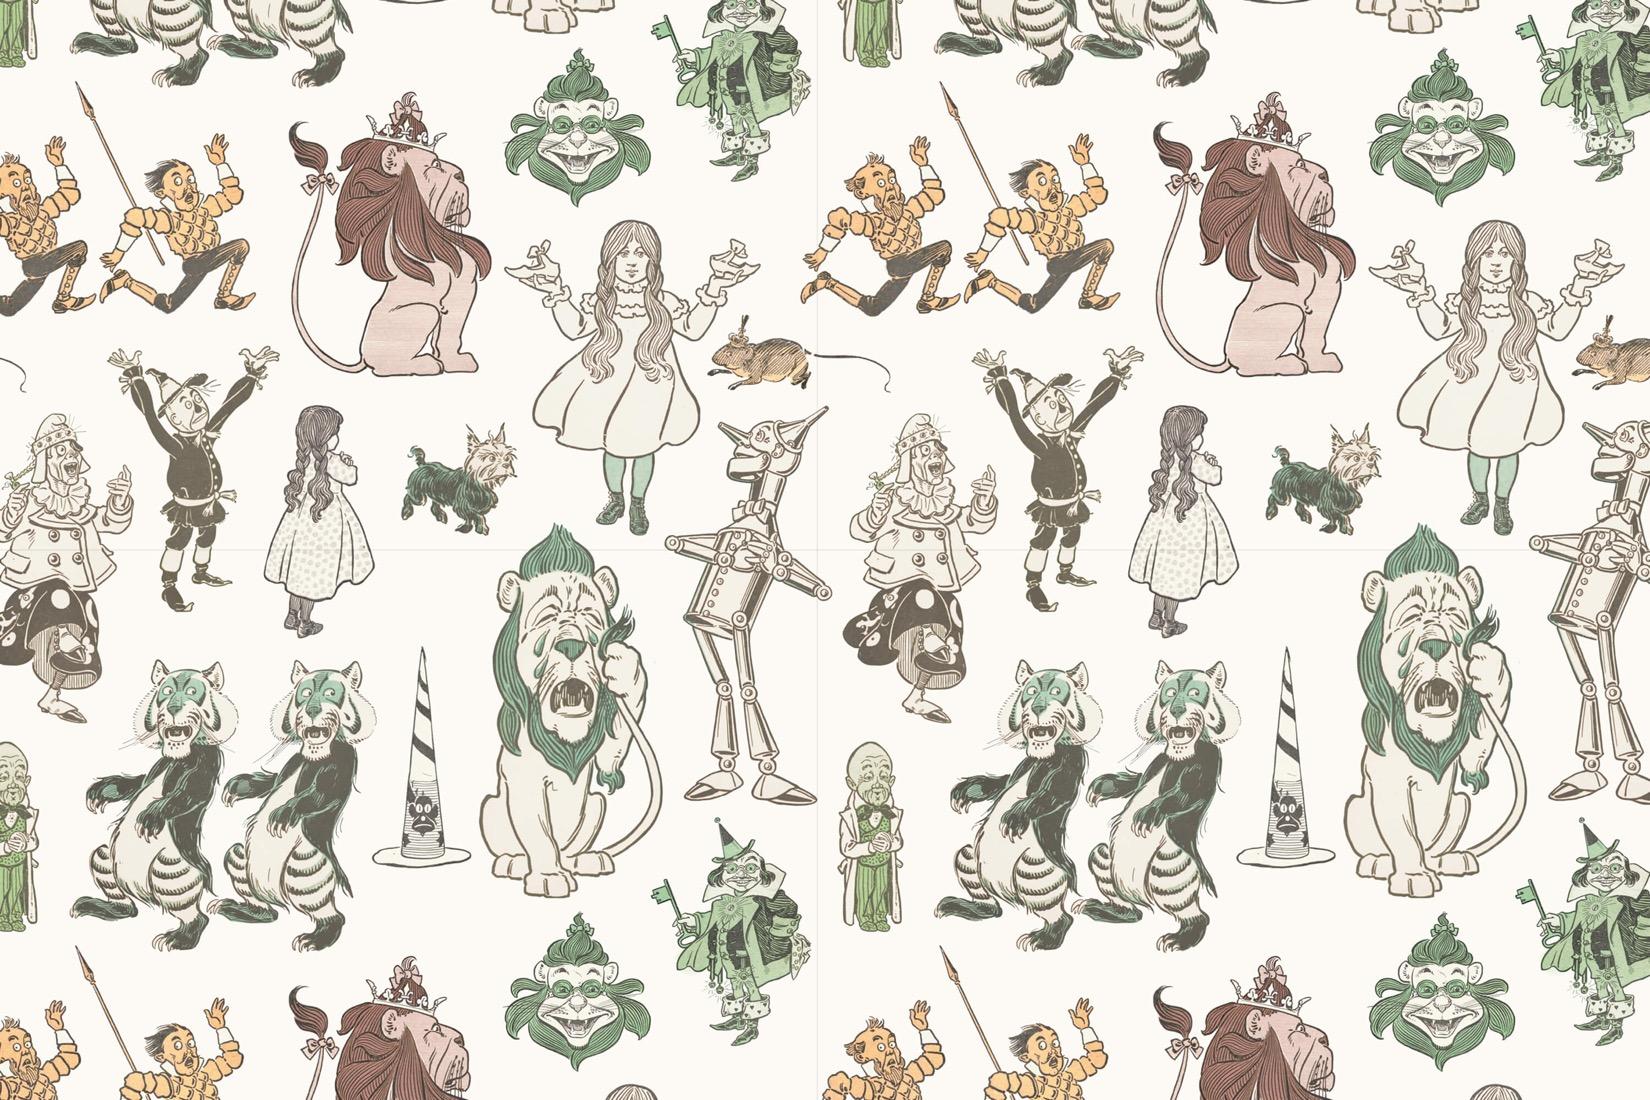 Wizard Of Oz clipart wallpaper Wallpaper Murals Oz Wallpaper of